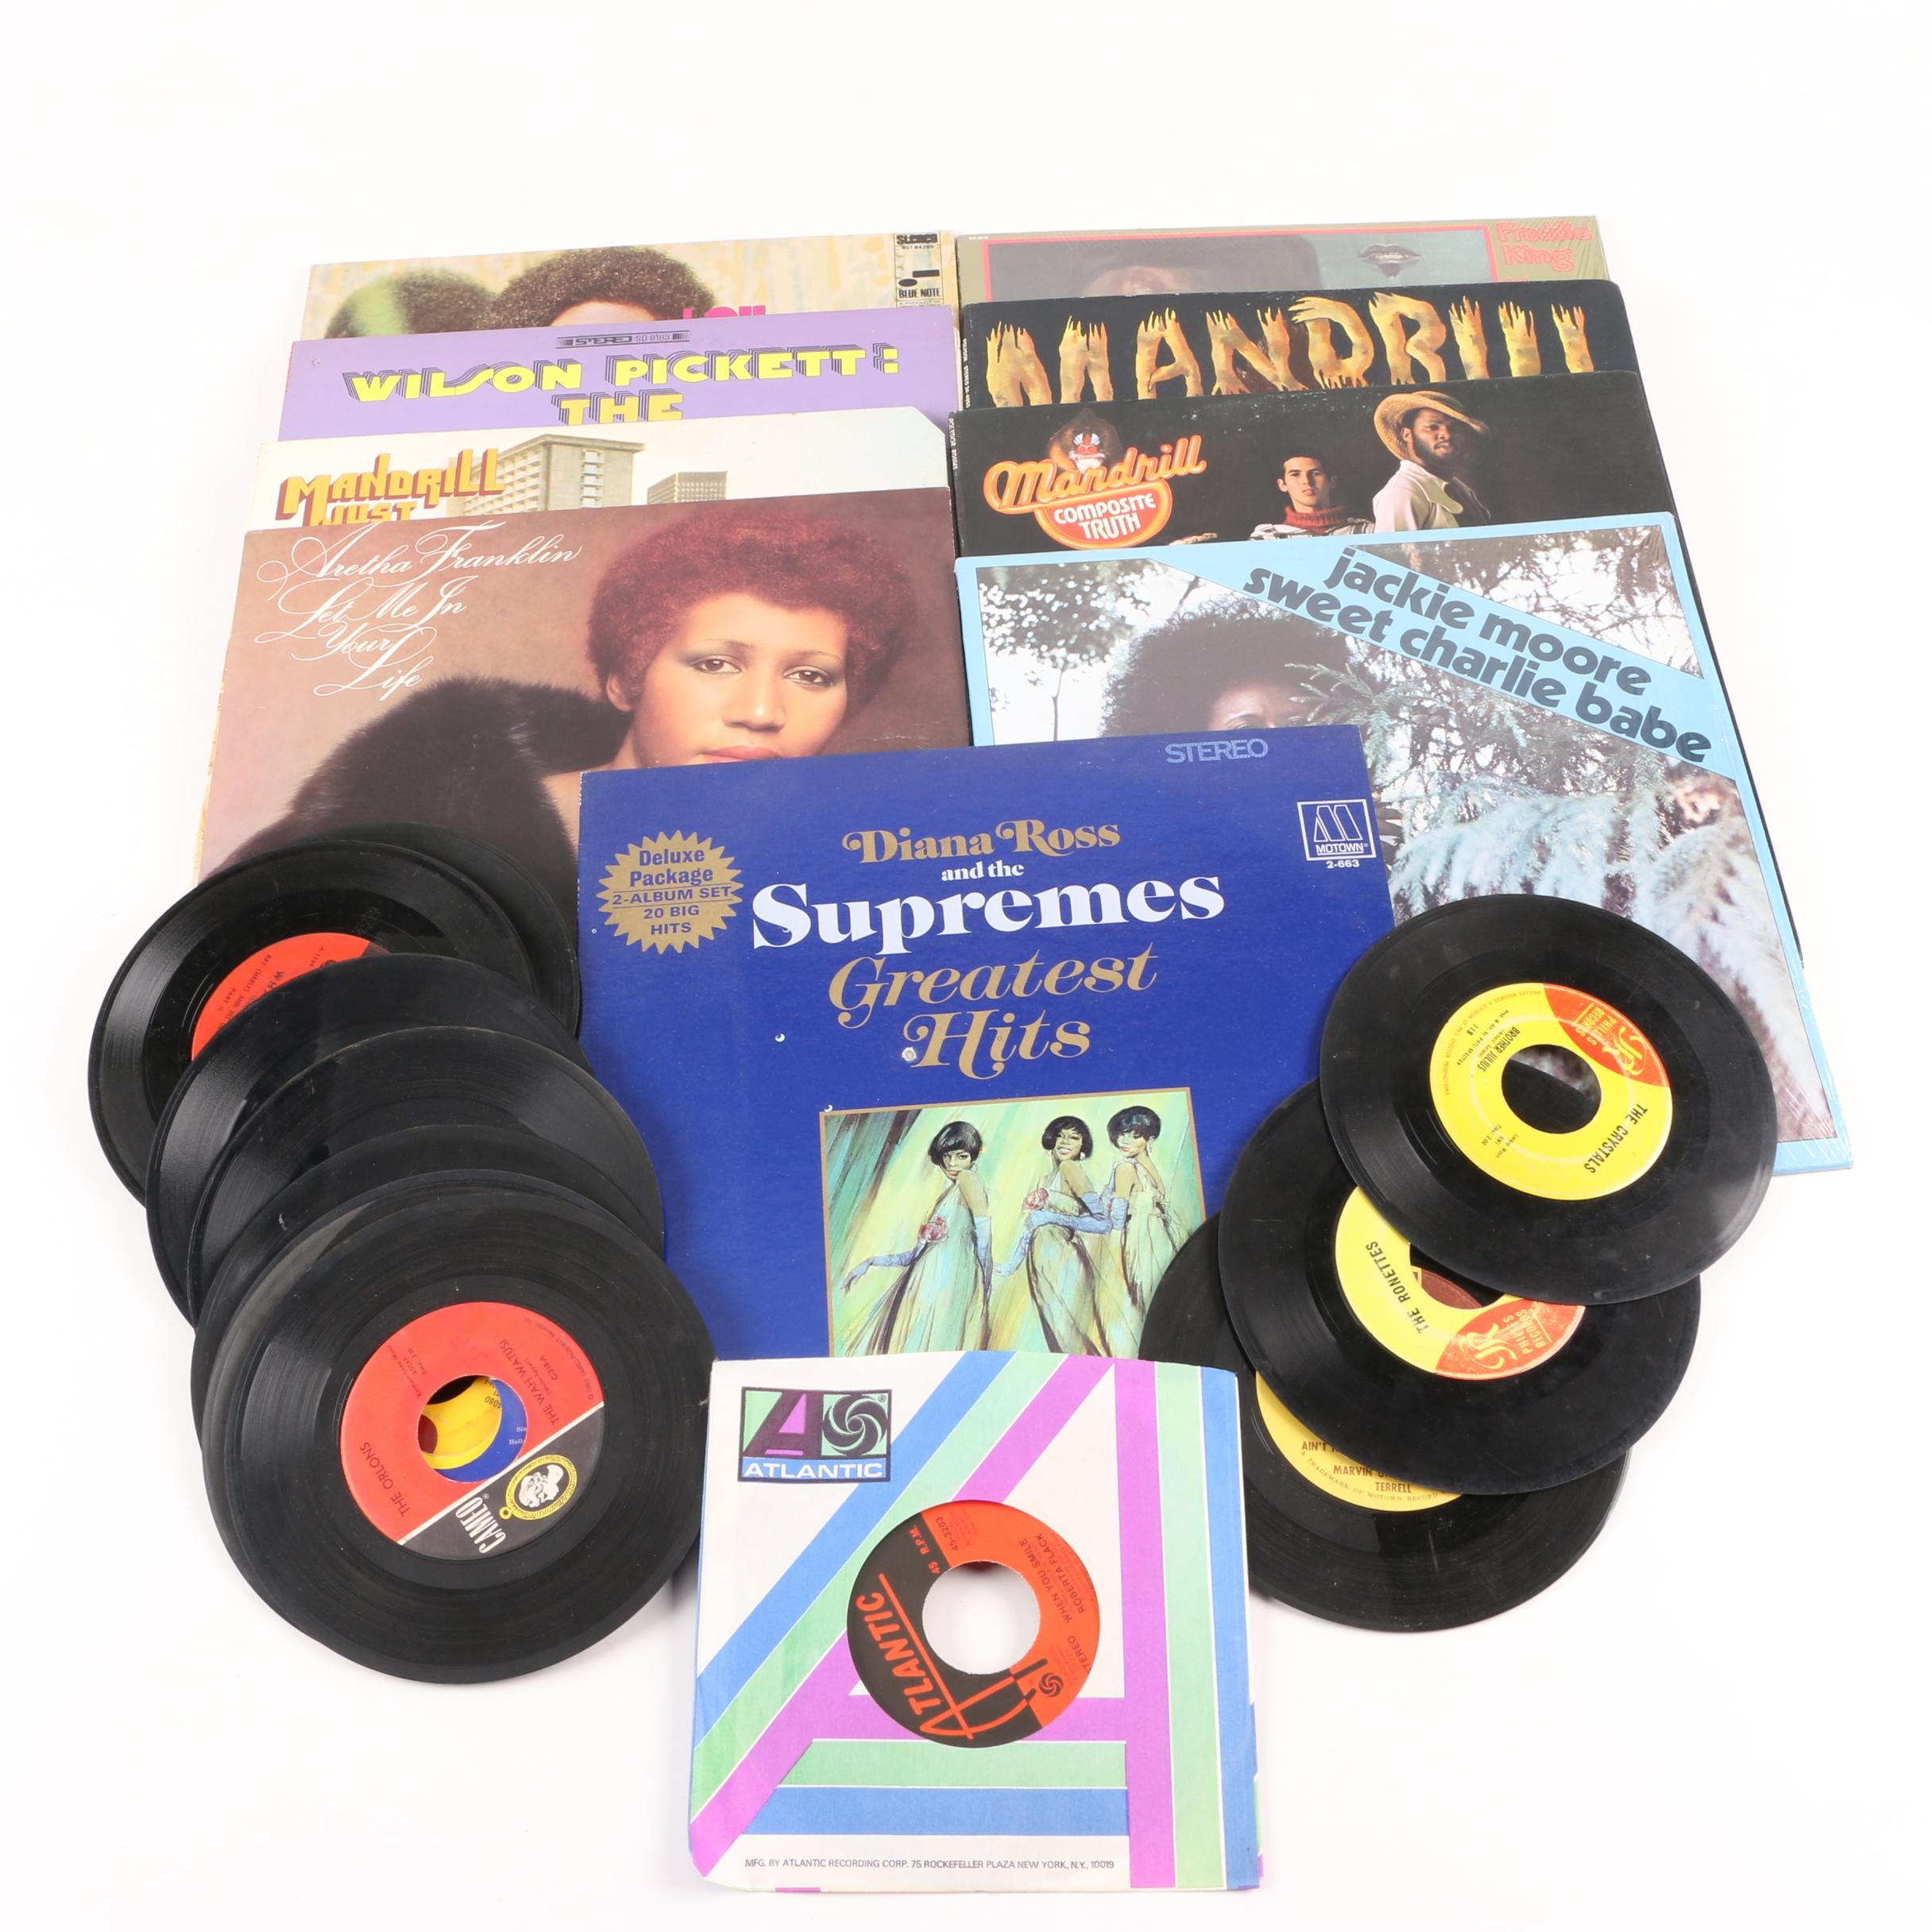 Soul, Jazz, Blues Records Including Lou Donaldson, Wilson Pickett, Supremes